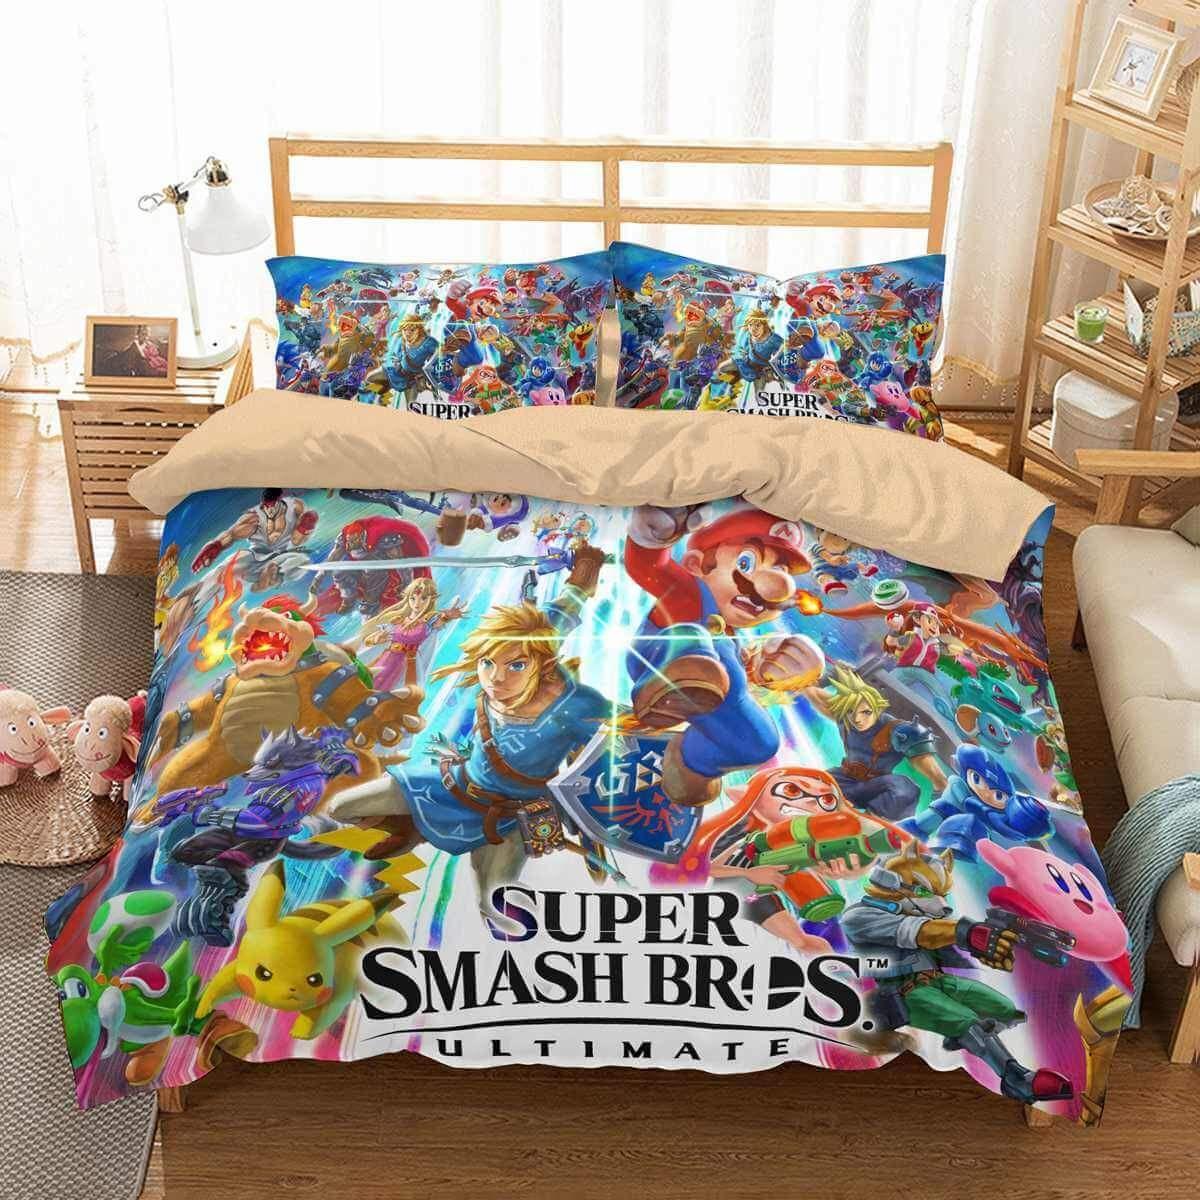 d4b732ec01a2 3D Customize Super Smash Bros Ultimate Bedding Set Duvet Cover Set Bedroom  Set Bedlinen